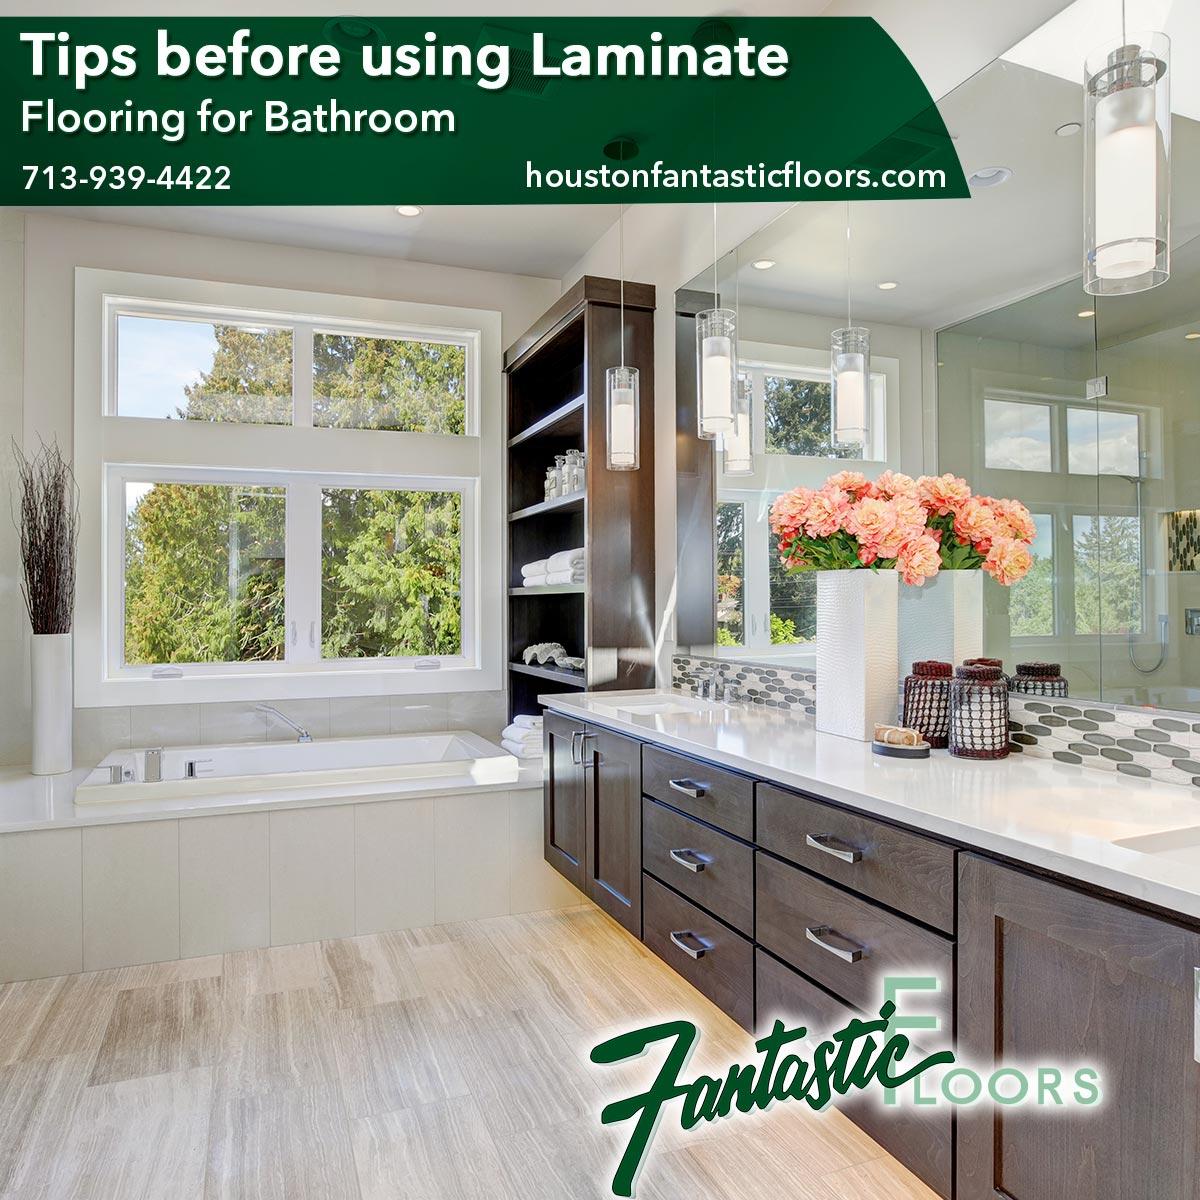 Phenomenal Fantastic Floors Inc Tips Before Using Laminate Flooring Interior Design Ideas Inesswwsoteloinfo